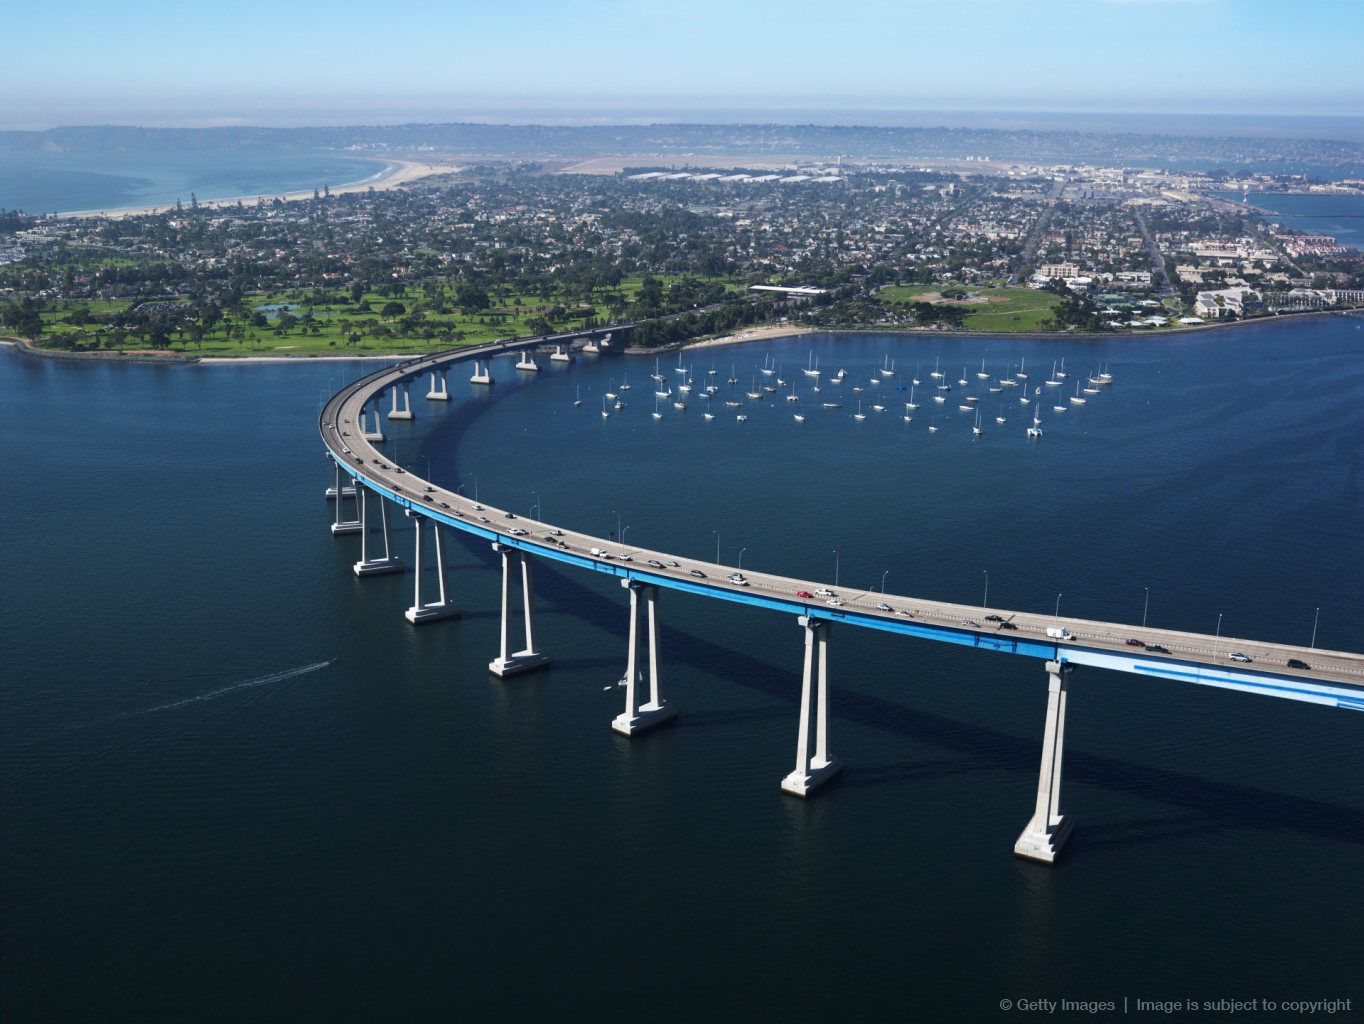 Image Detail For San Diego Coronado Bay Bridge Coronado Bridge San Diego California San Diego County